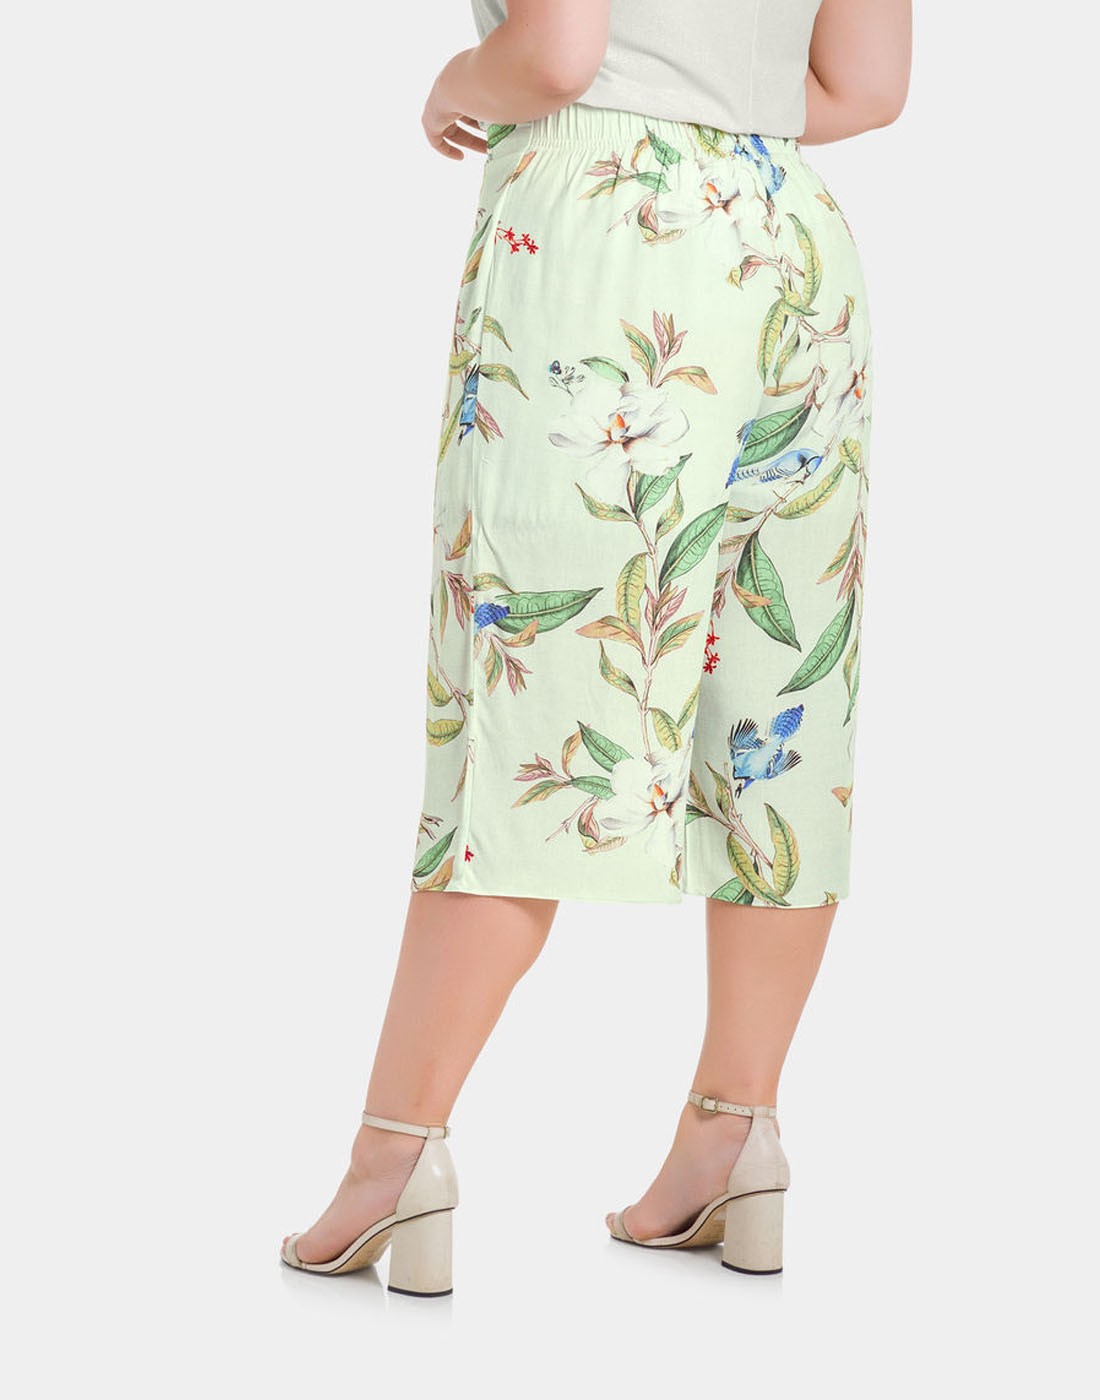 Calça Pantacourt Tecido Rayon Bali Off White Lunender Mais Mulher